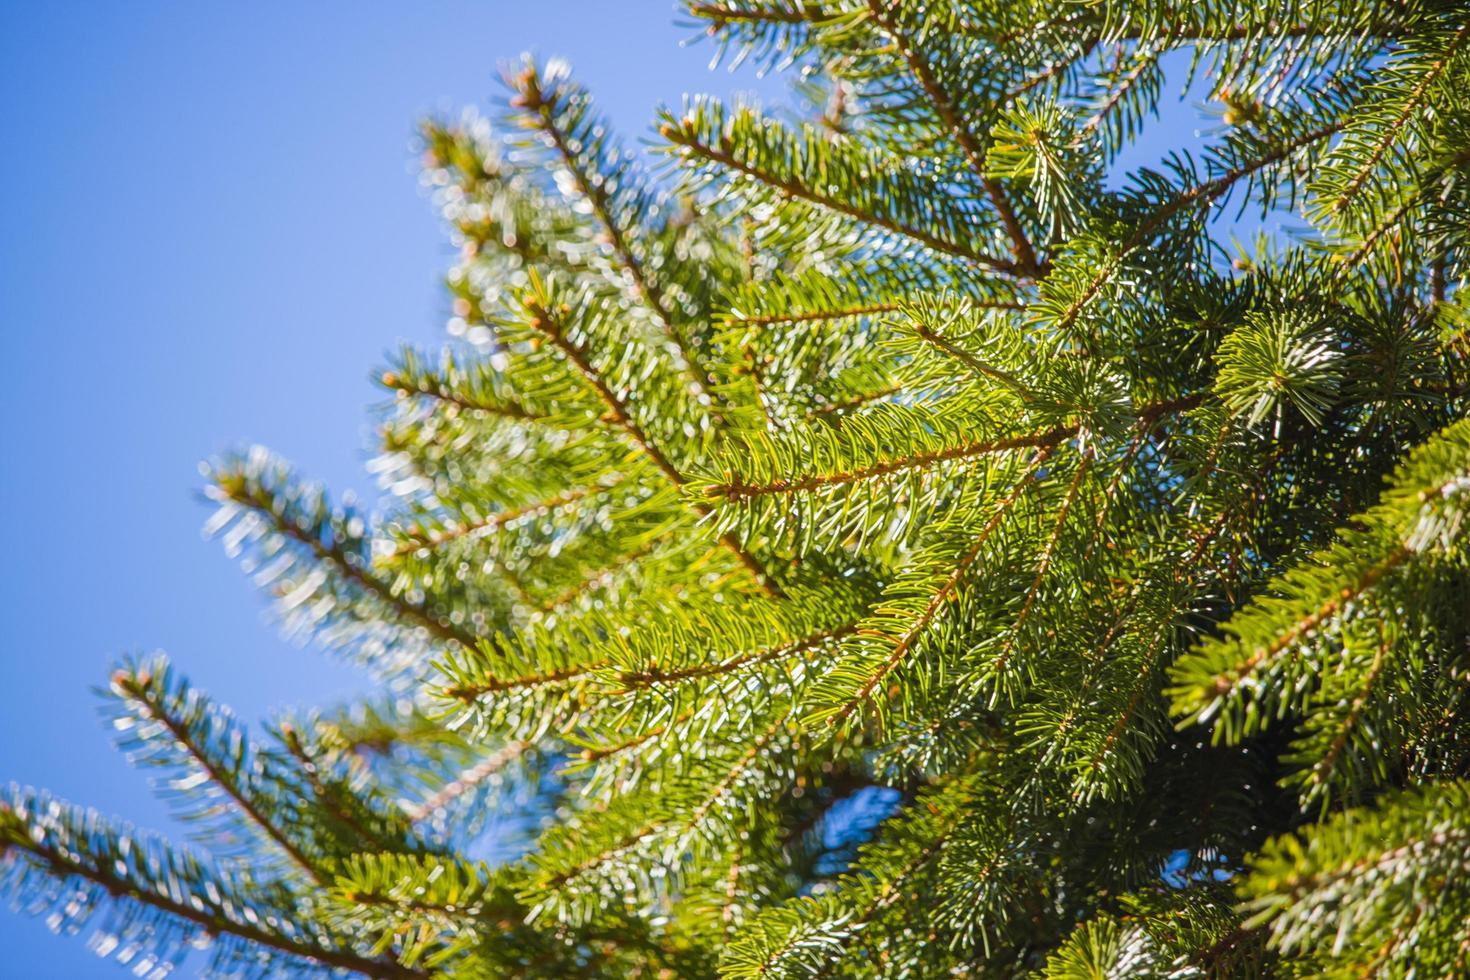 albero dalle foglie verdi foto